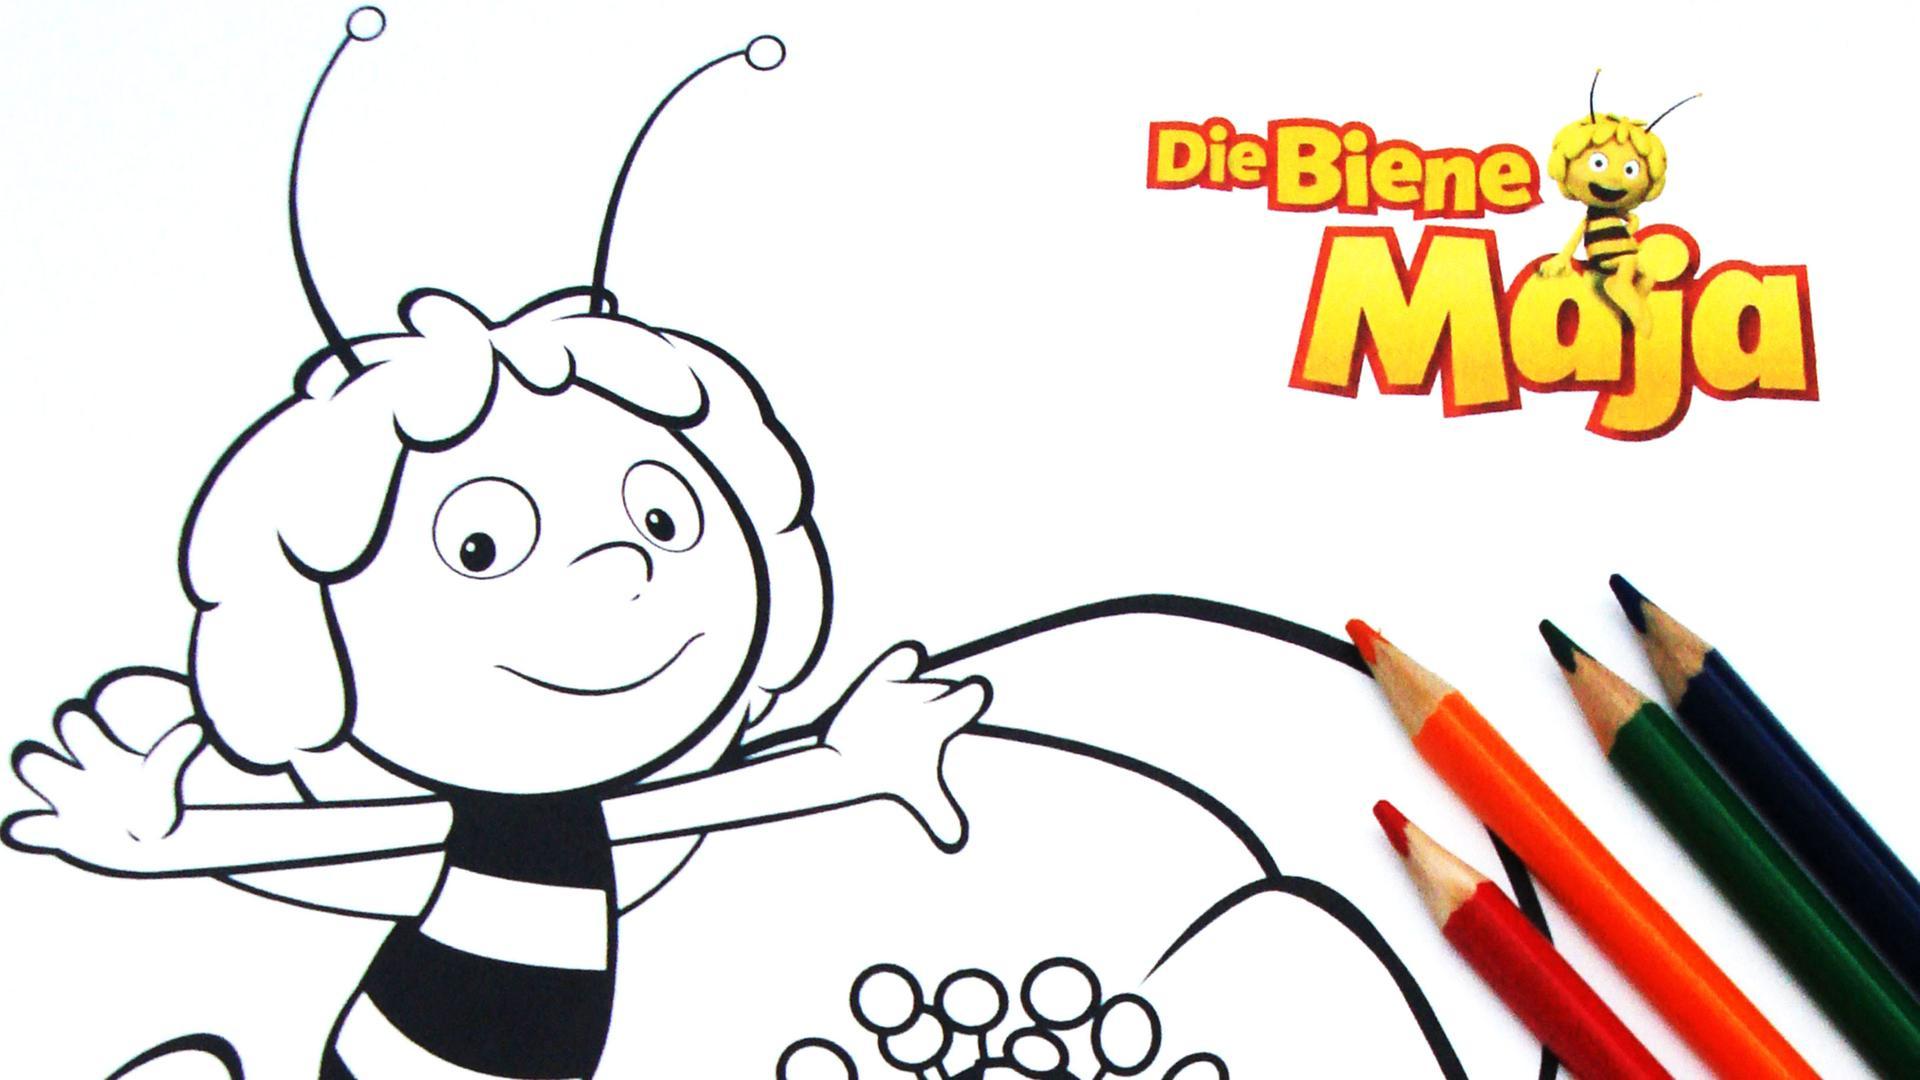 Kika - Ausmalbilder Biene Maja für Biene Maja Willi Malvorlage